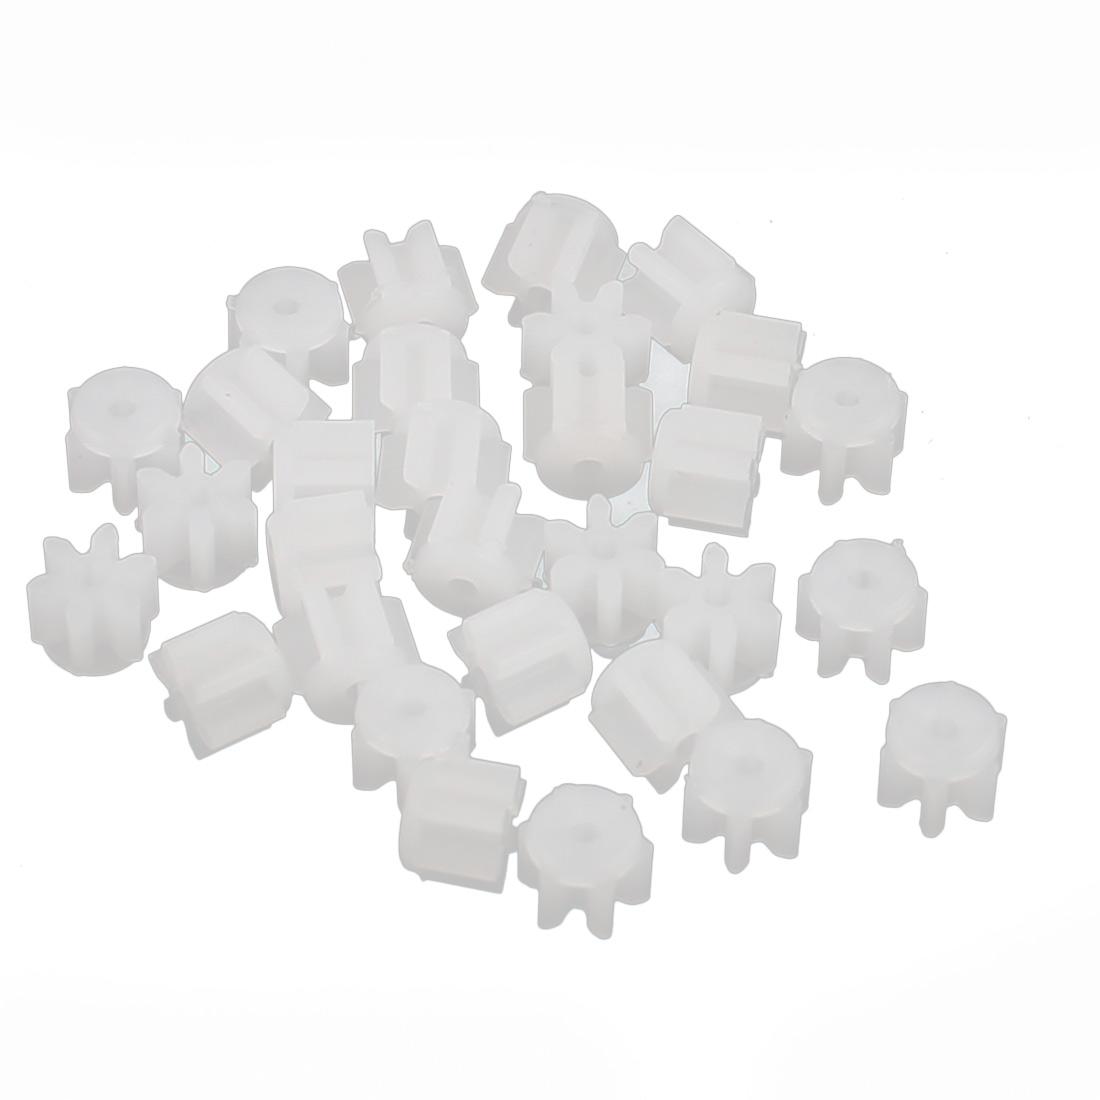 30PCS 6 Teeth 0.3mm Hole Diameter Plastic Front Gear Wheel for RC Car